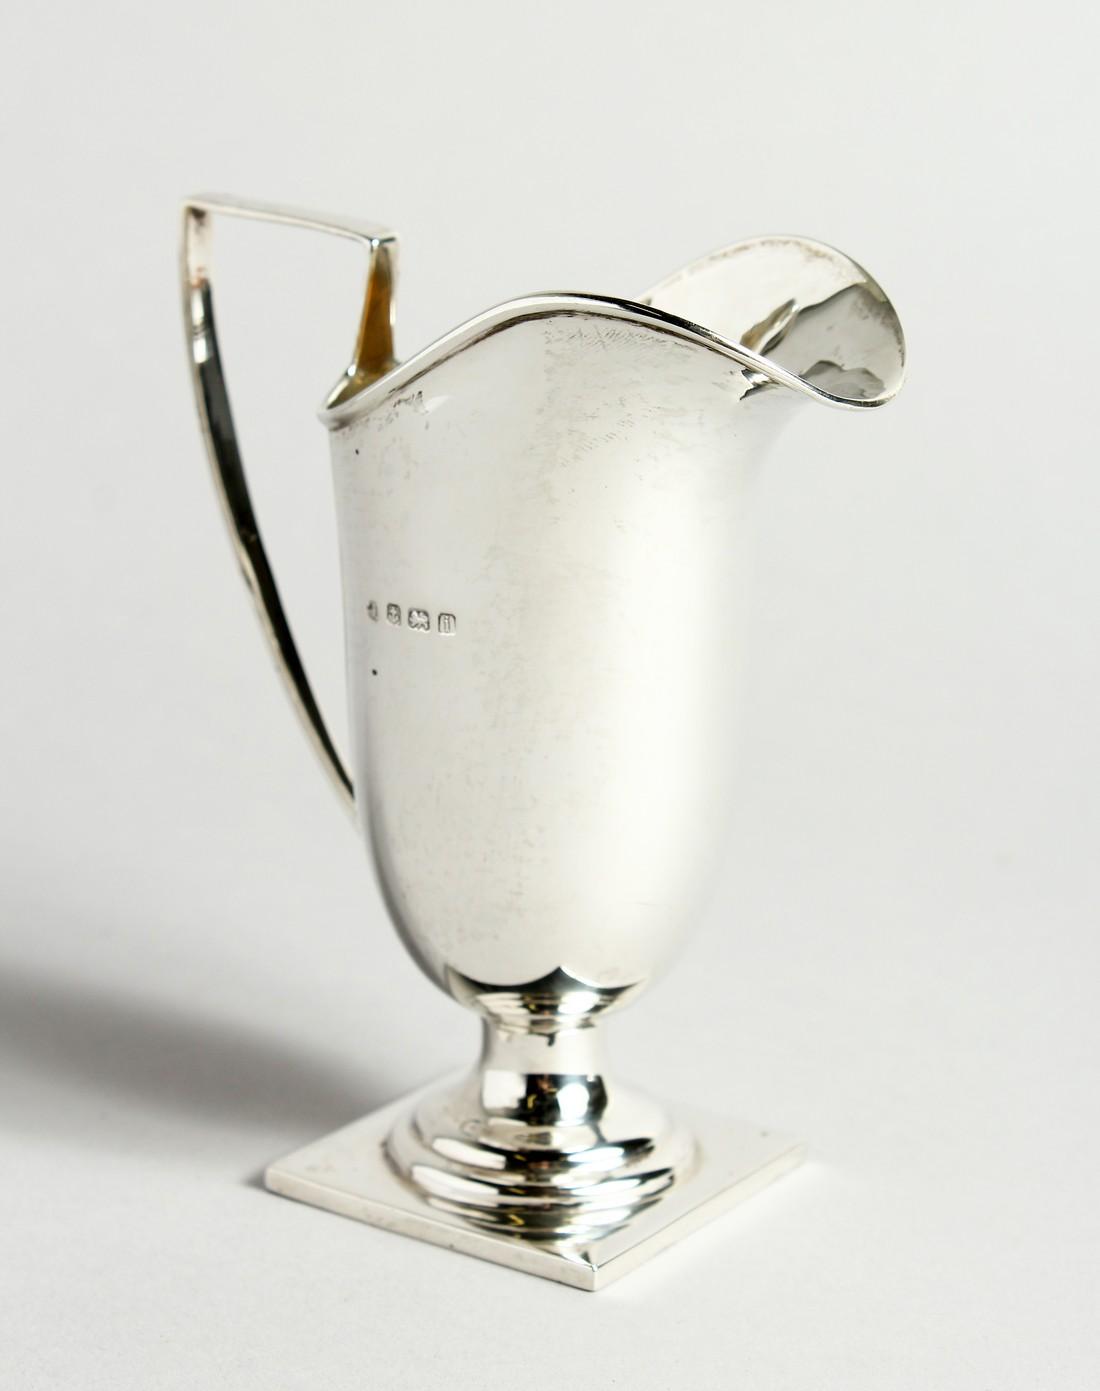 A HELMET-SHAPED SILVER CREAM JUG on a square base. Birmingham 1908. 12cm tall - 78g